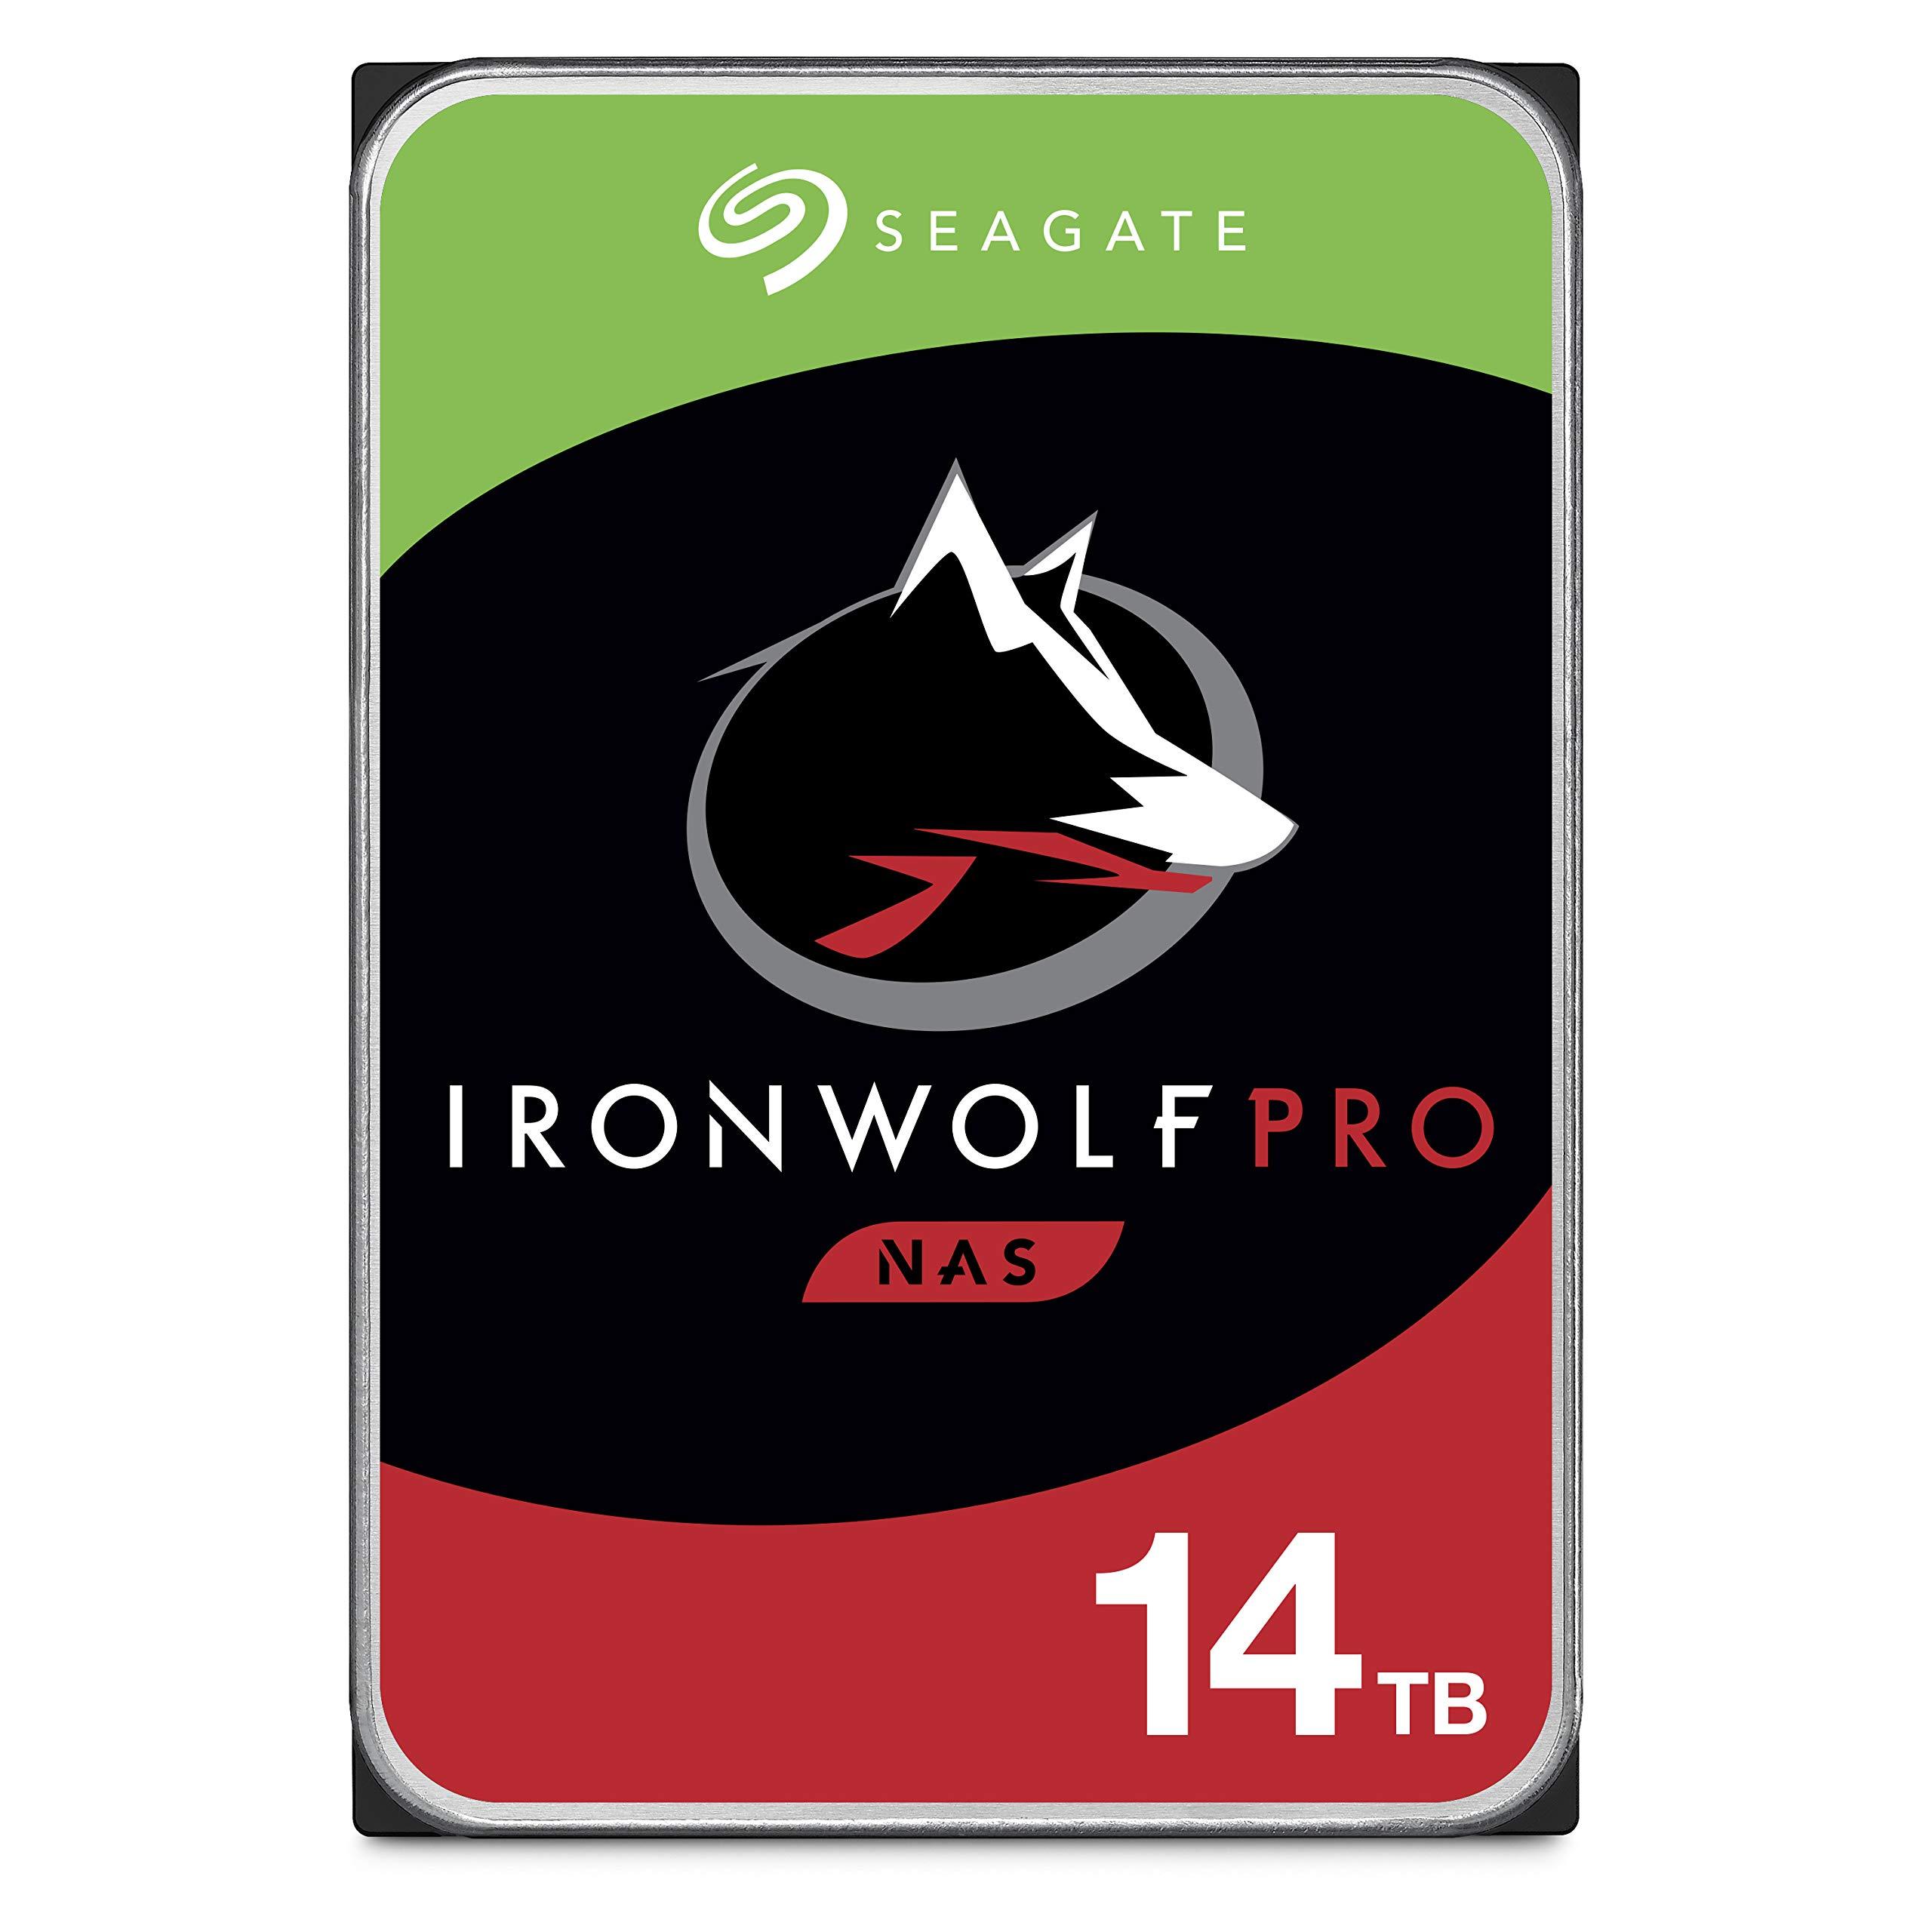 HDD 4TB SATA Seagate IronWolf Pro 14TB NAS 3.5in 6Gb/s 7200